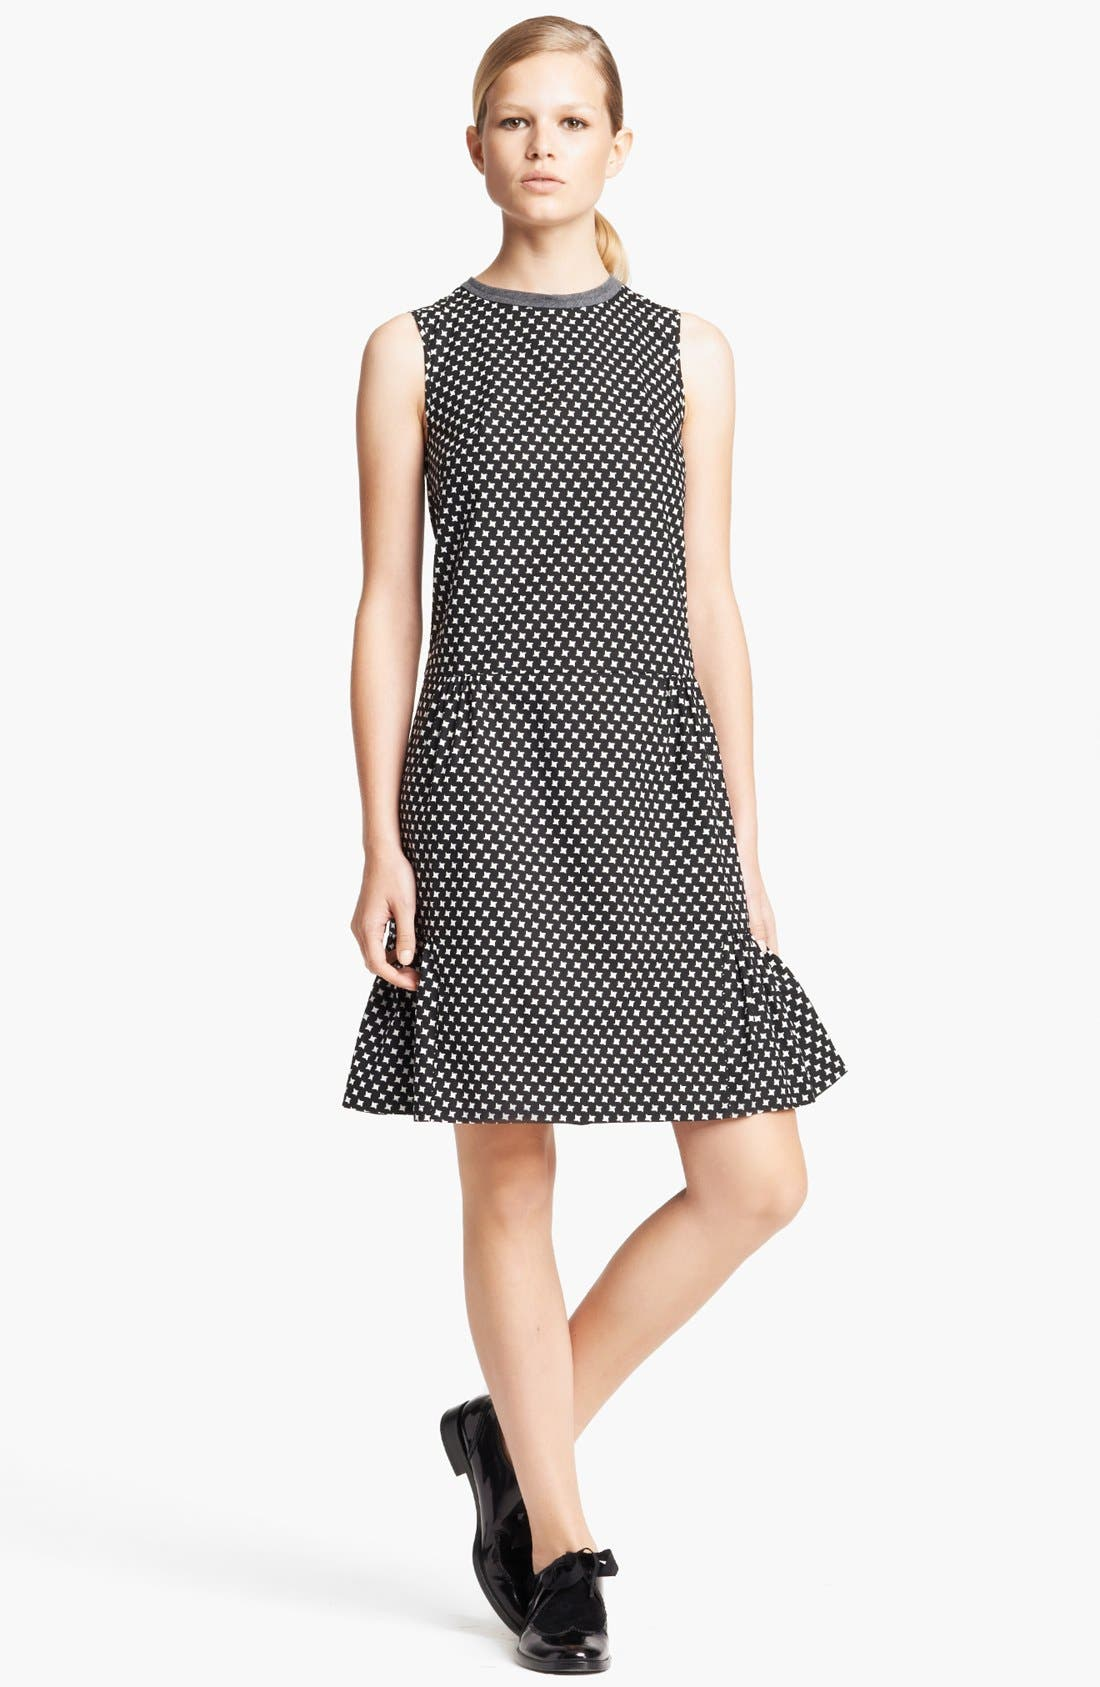 Main Image - Marni Houndstooth Print Full Skirt Dress